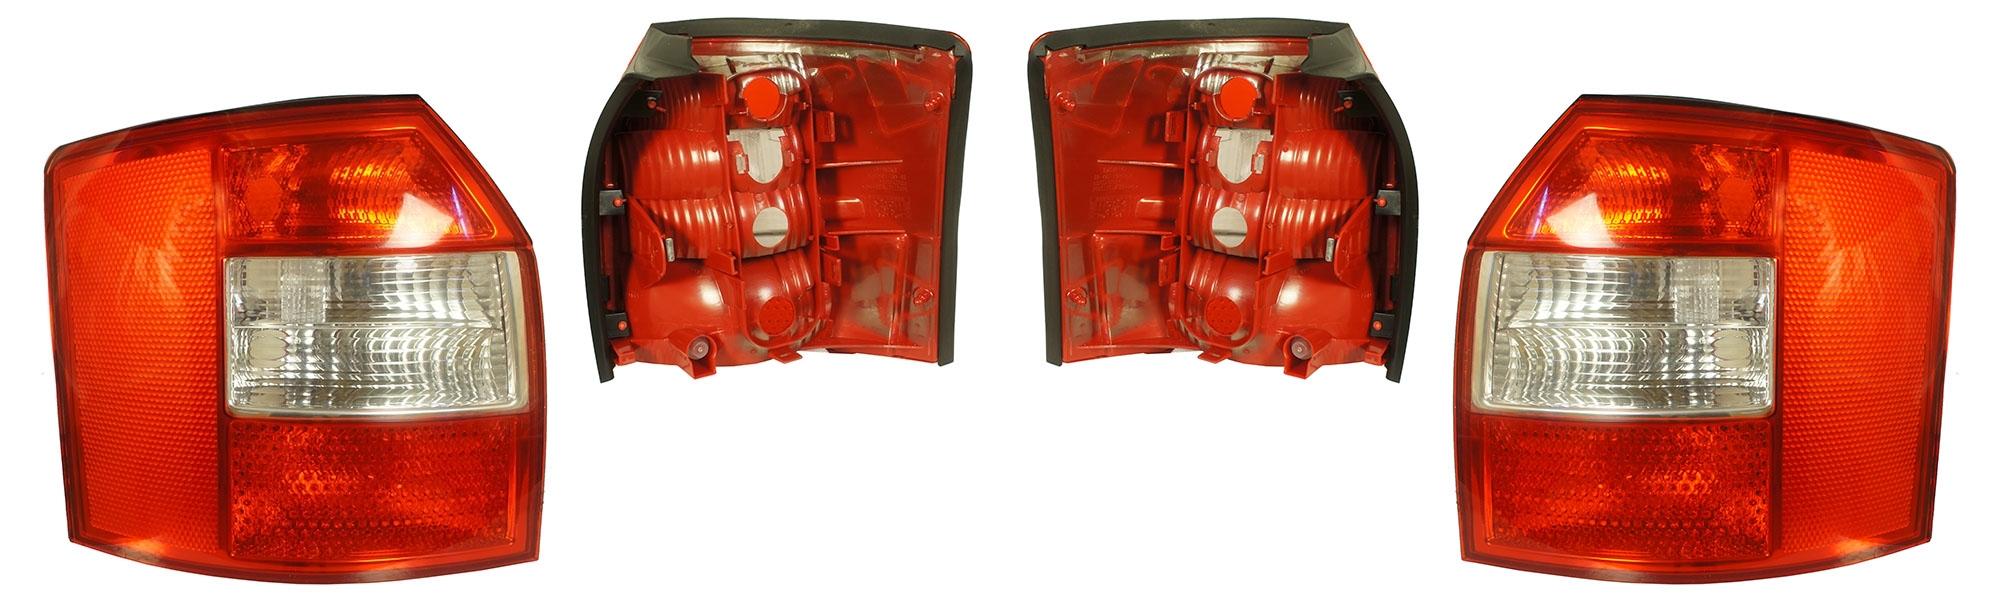 Lampy Tyl Audi A4 Vendoriapl